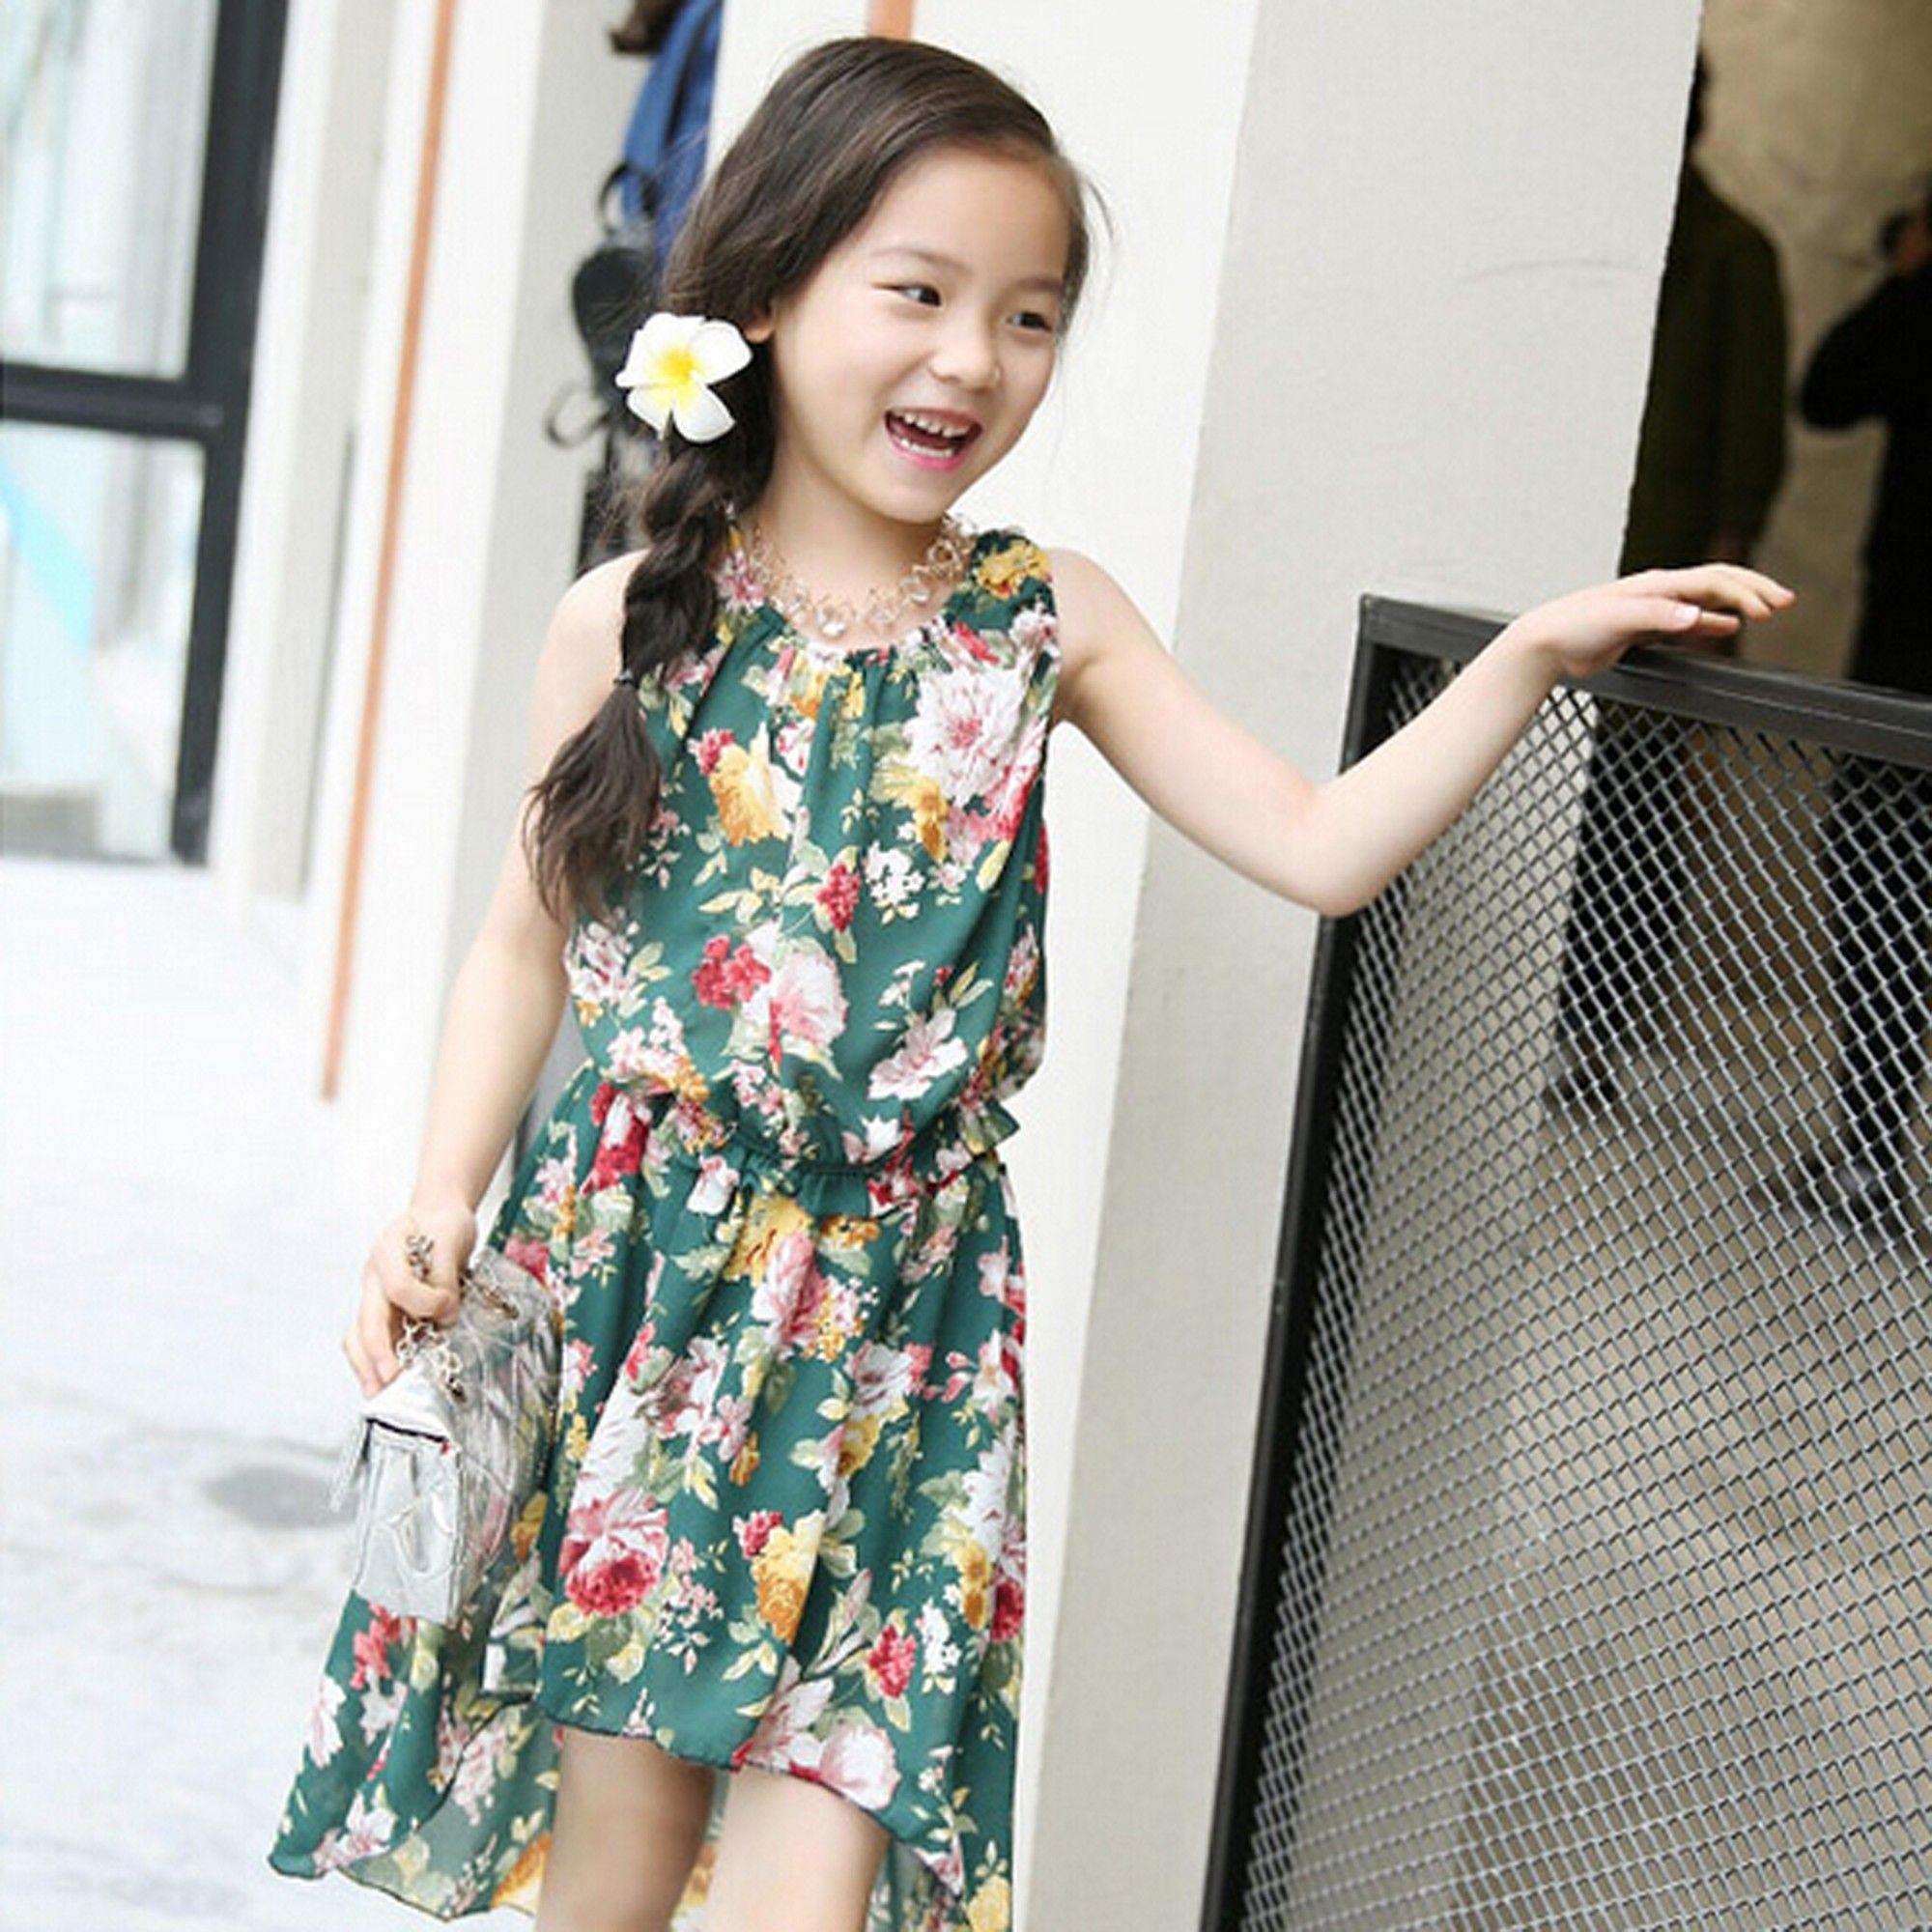 Green Floral Print Dress - Lil Mantra